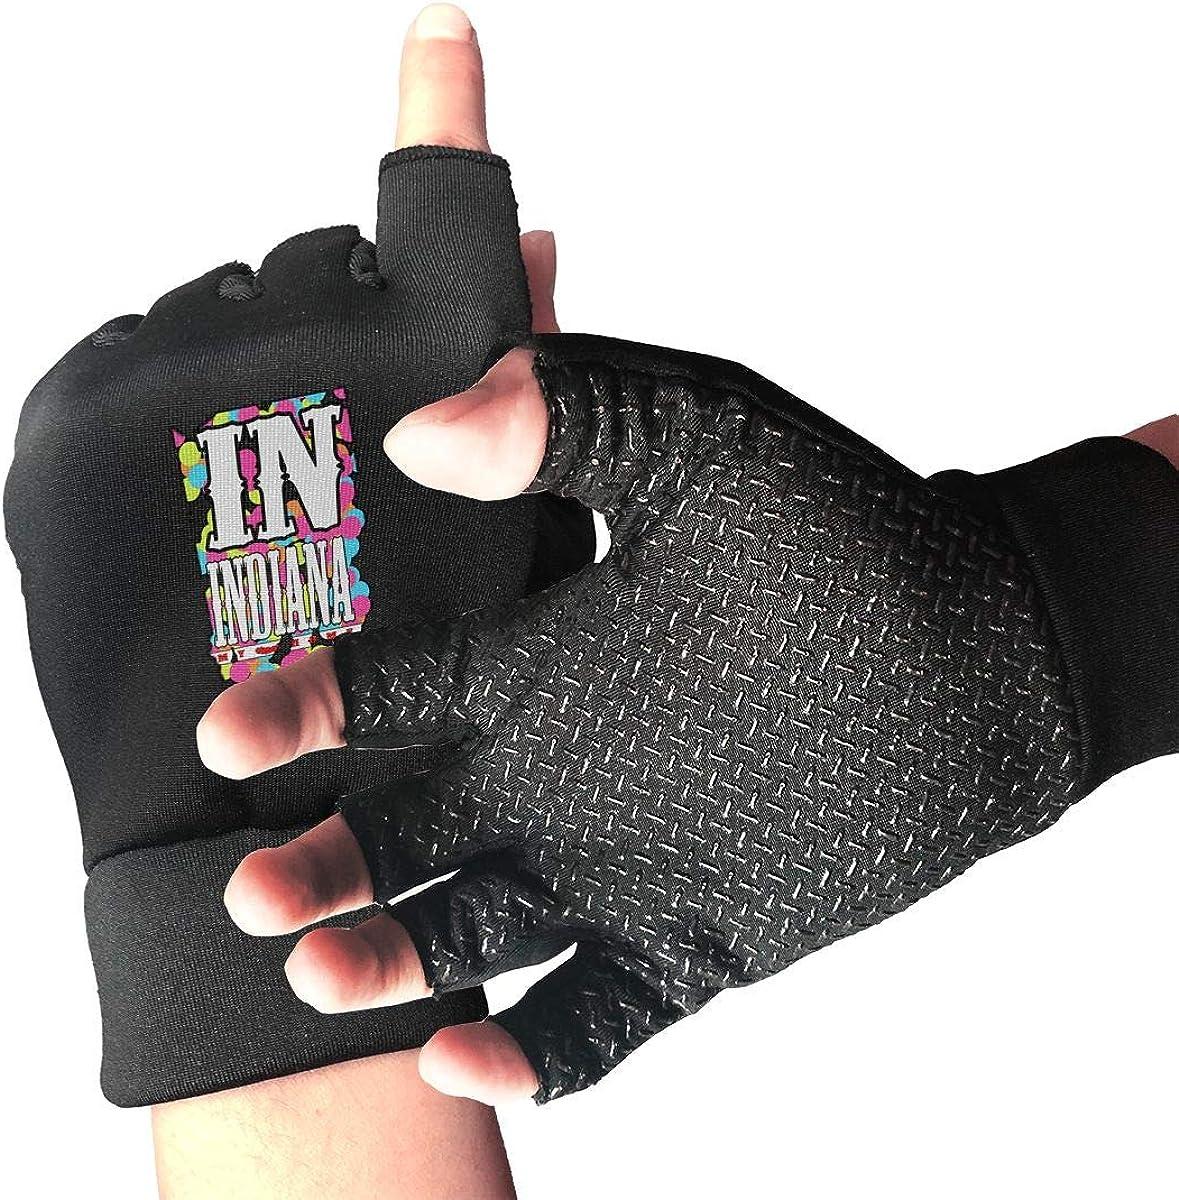 Gloves Colorful Indiana Fingerless Gloves Short Touchscreen Gloves Winter Motorcycle Biker Mitten